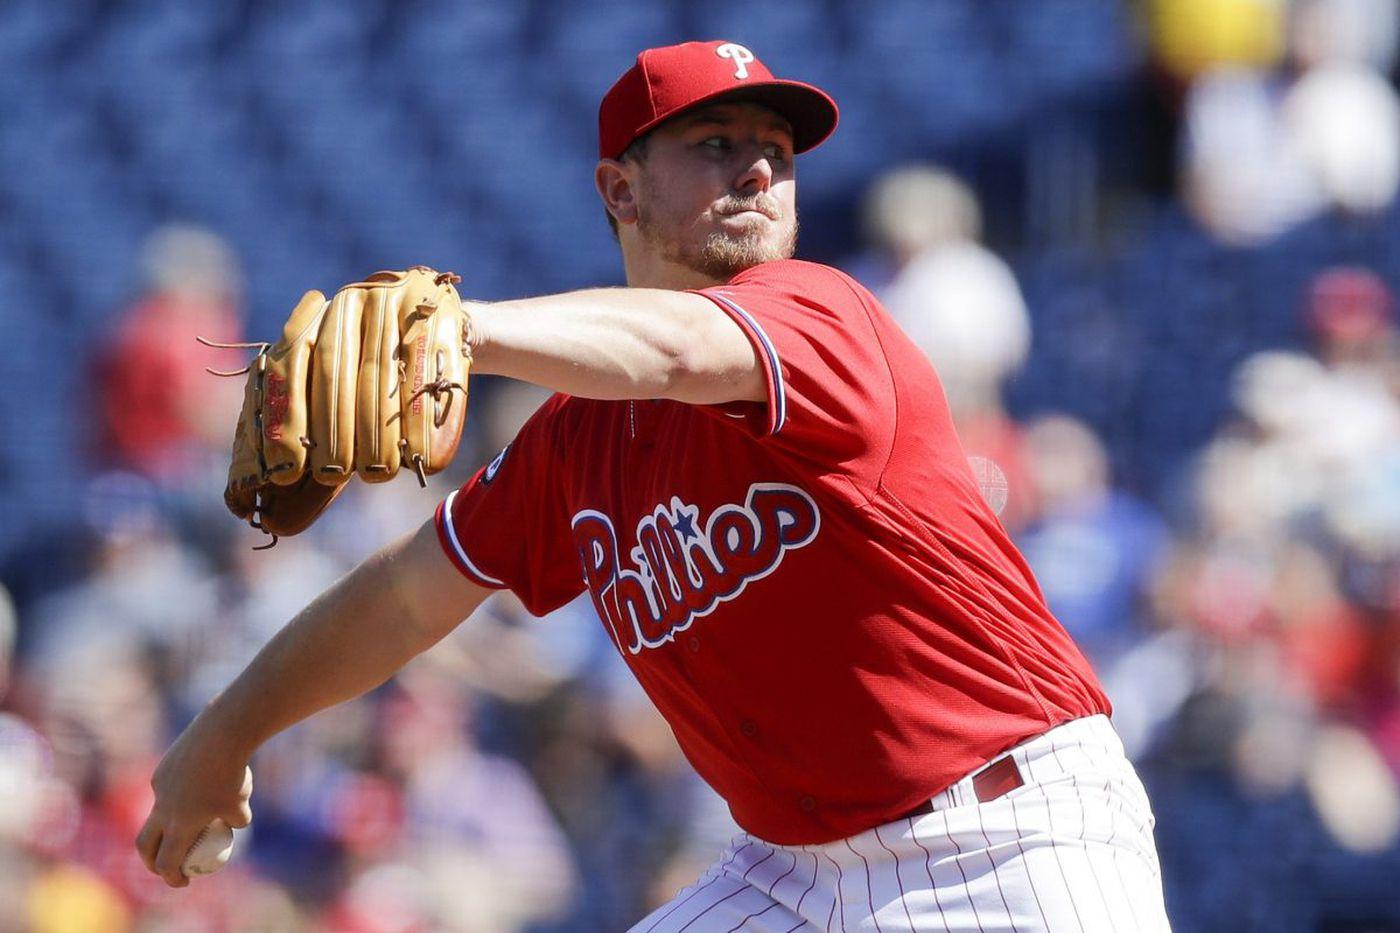 Phillies pitcher Mark Leiter Jr. to start season on disabled list